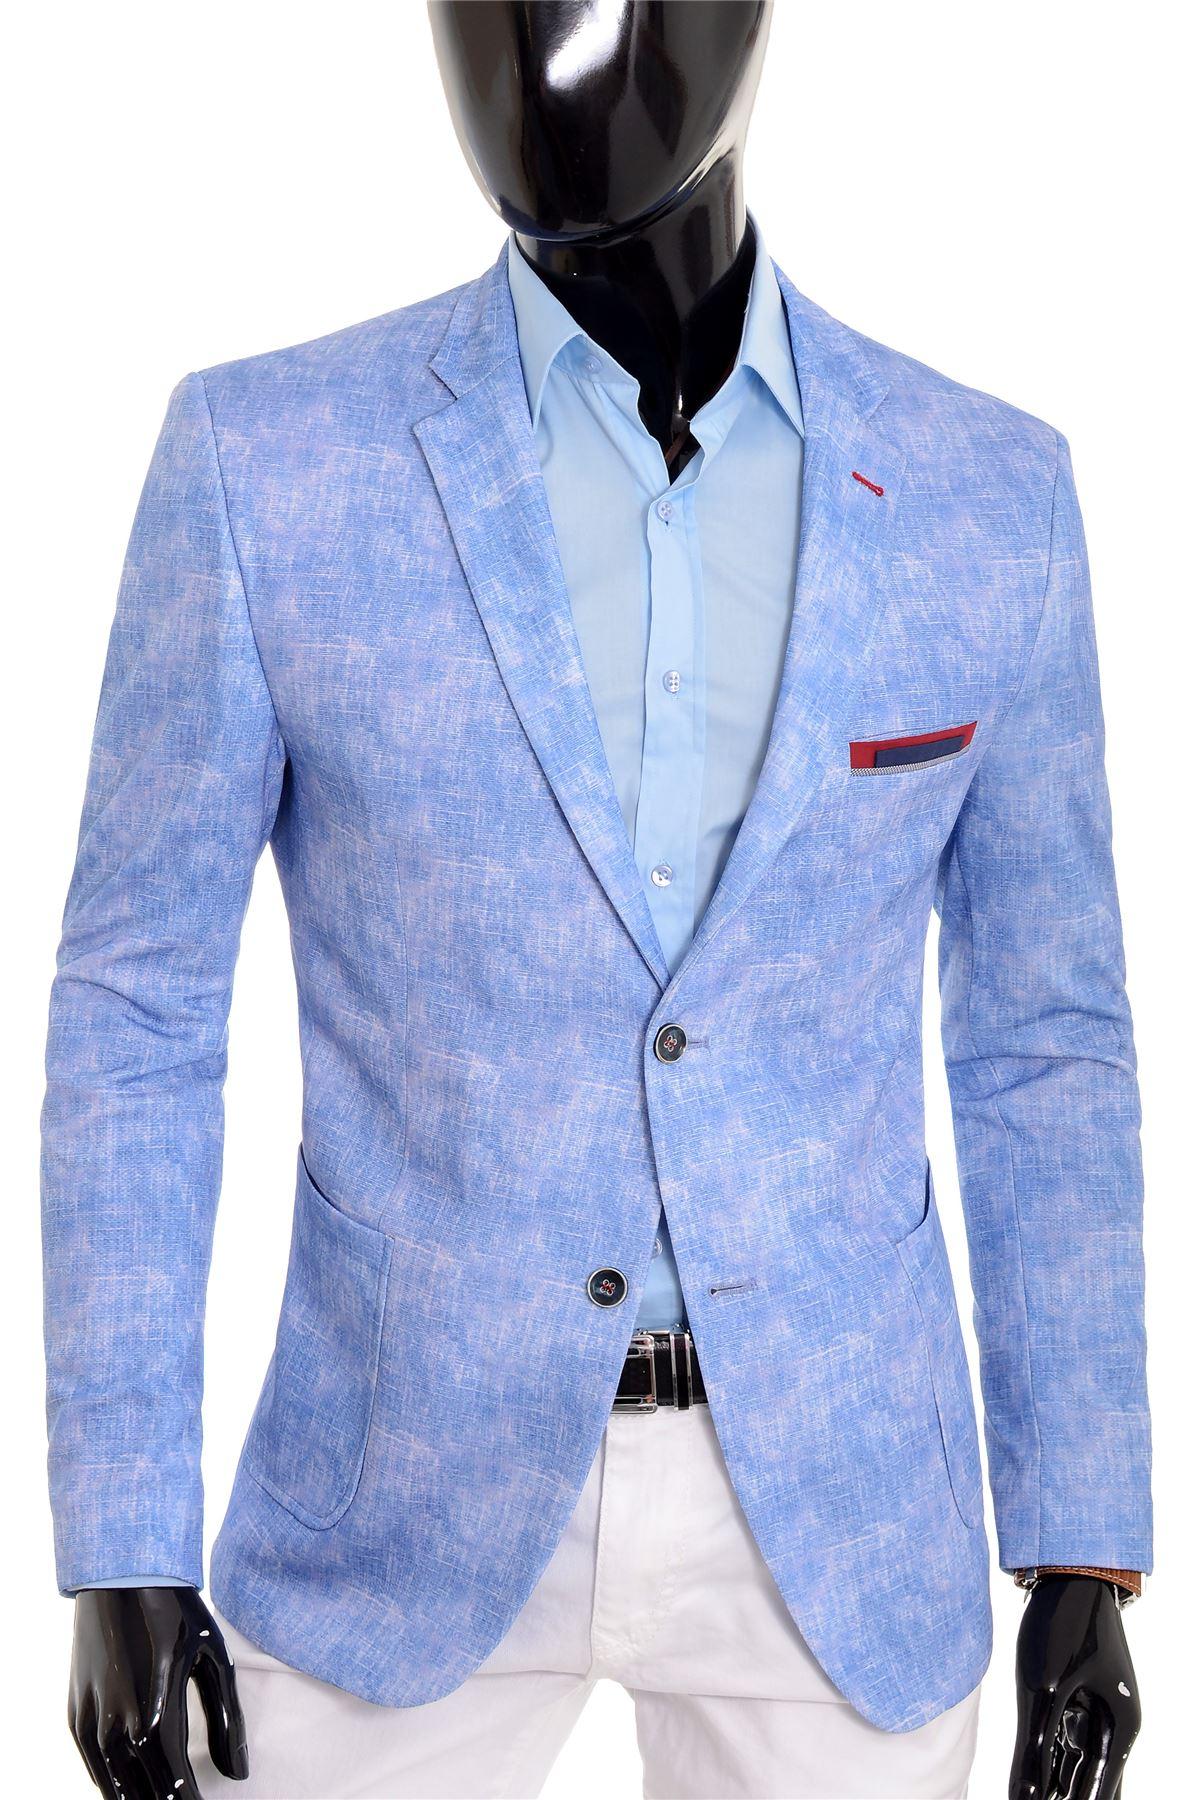 Men S Light Blue Blazer Jacket Casual Smart Slim Fit Summer Red